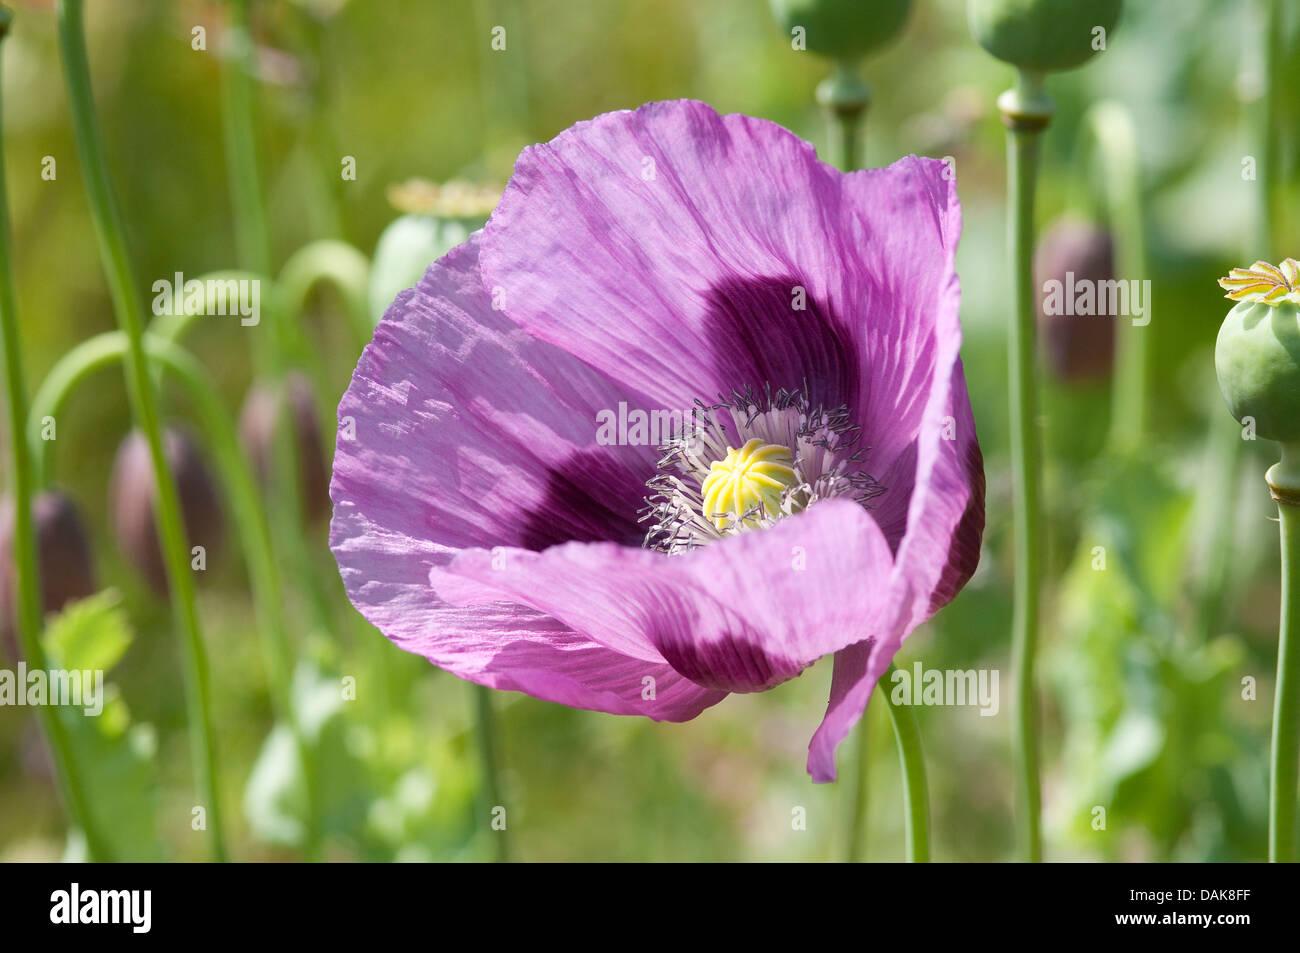 purple poppy flower stock photos purple poppy flower stock images